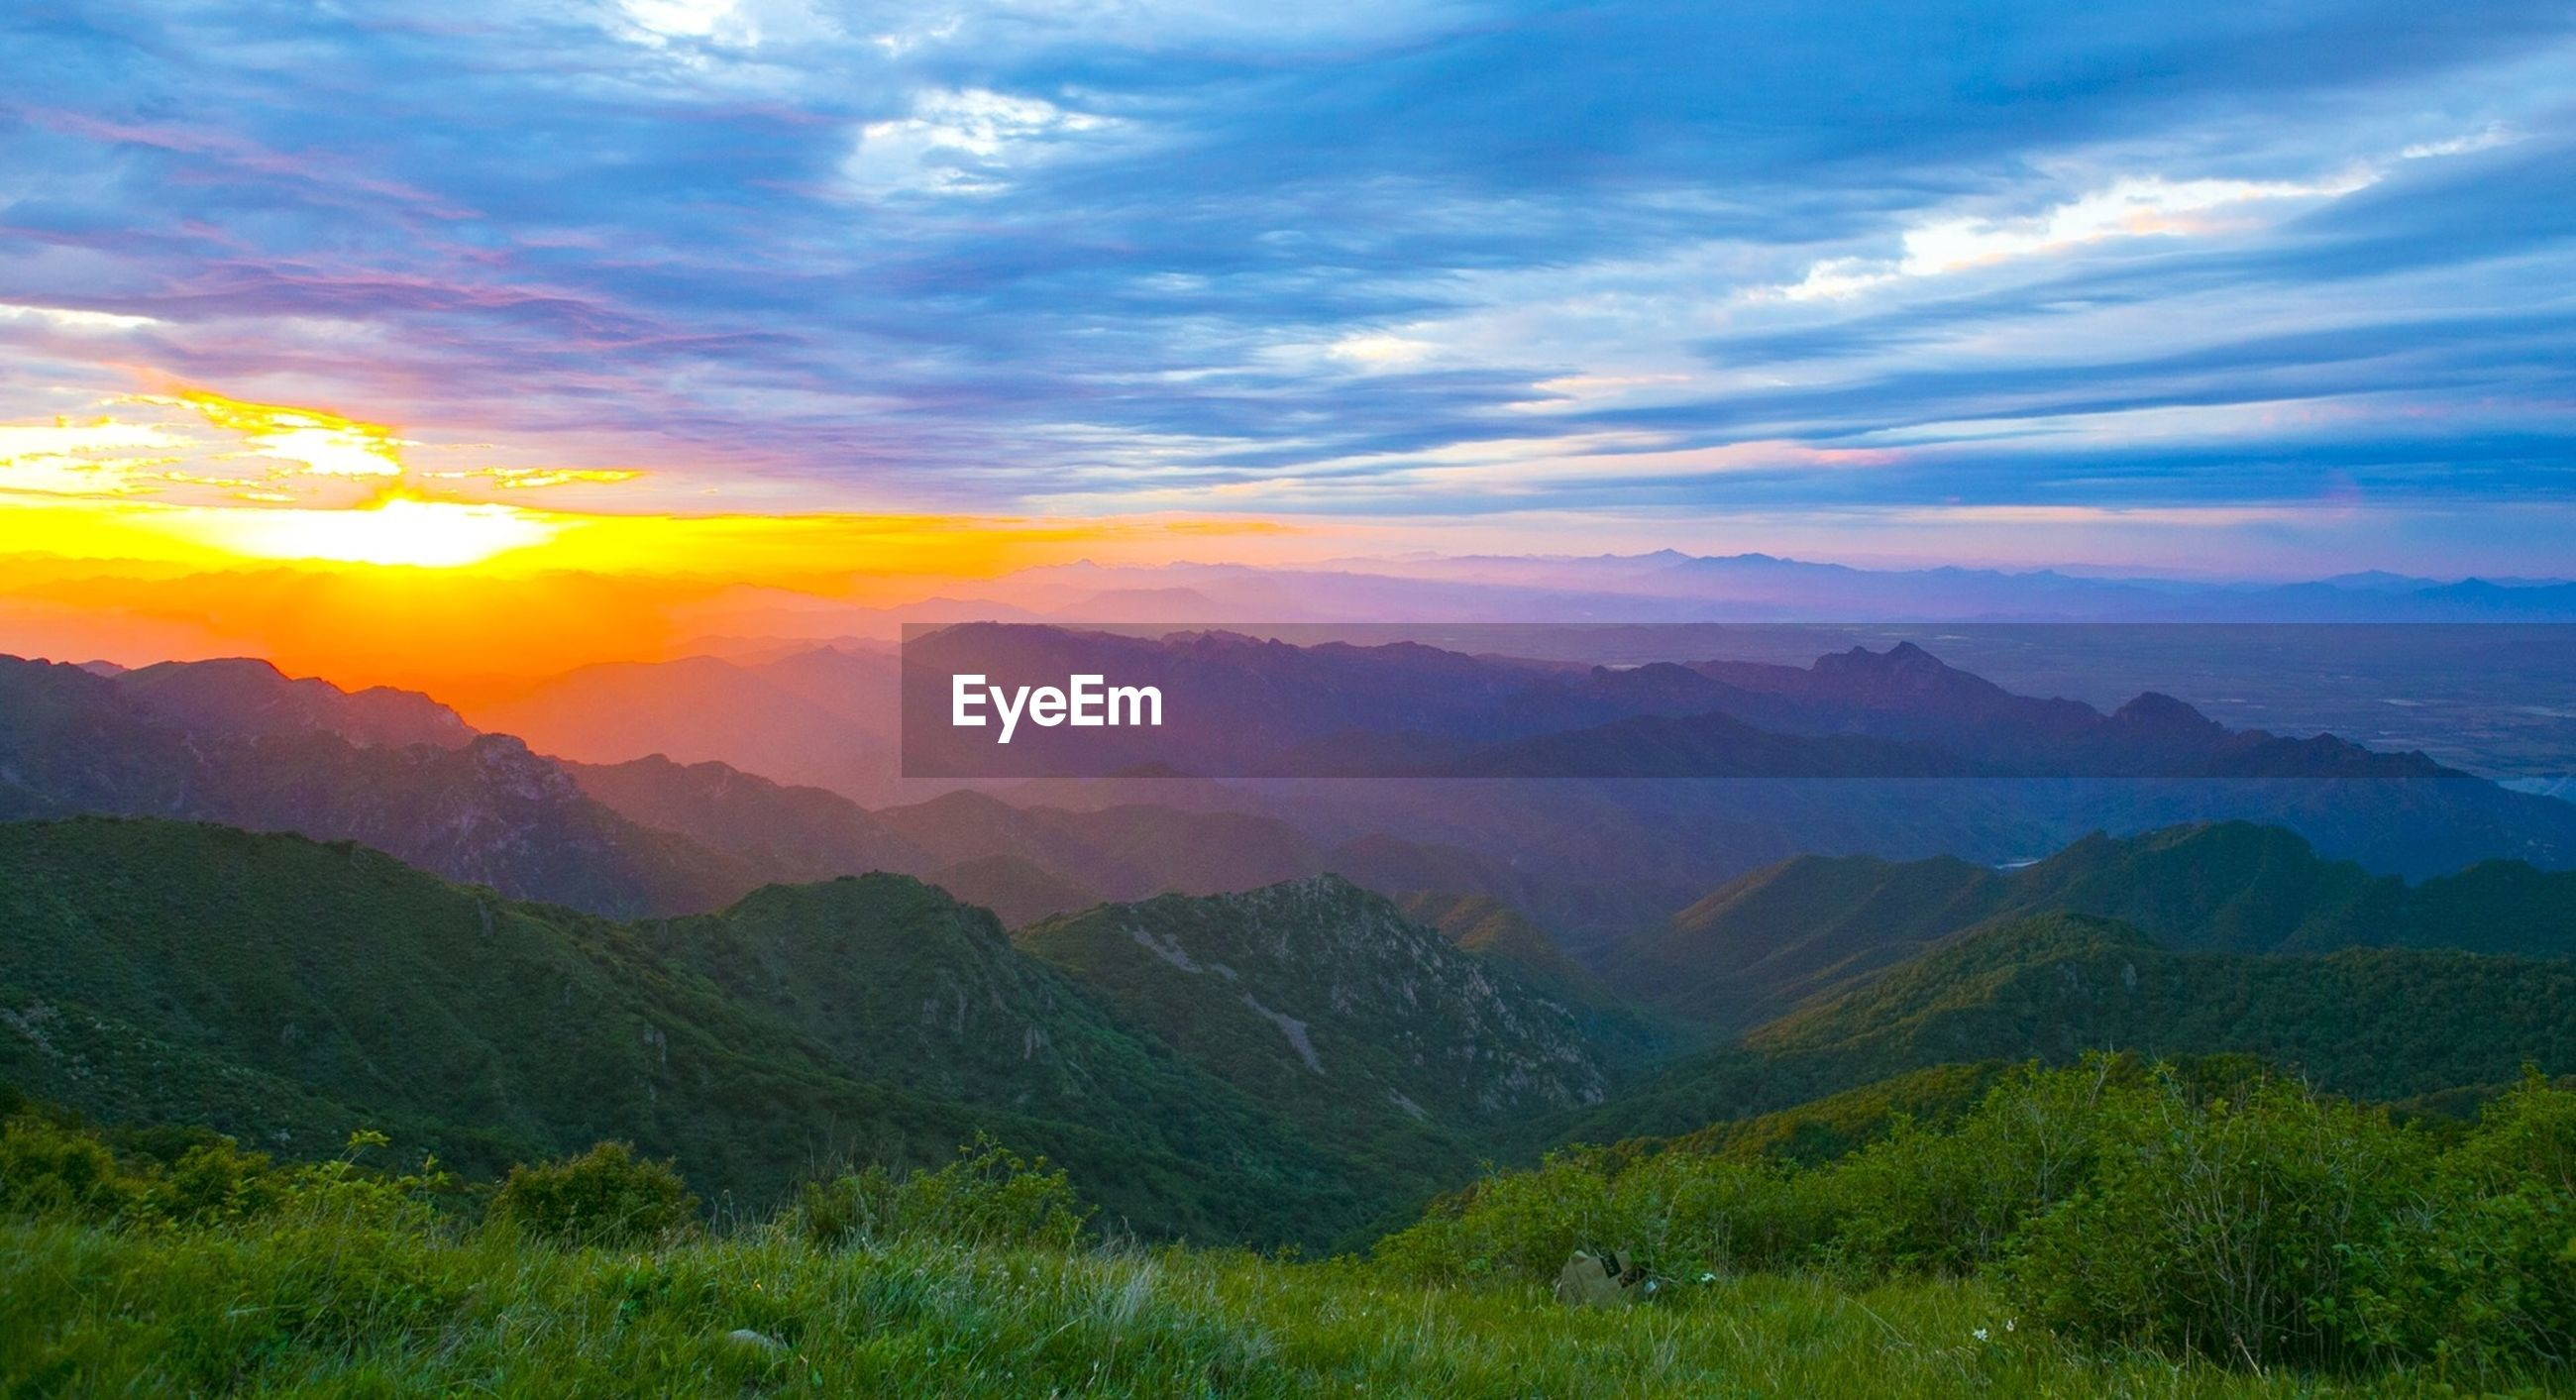 tranquil scene, scenics, mountain, tranquility, beauty in nature, landscape, sky, sunset, mountain range, nature, cloud - sky, idyllic, cloud, non-urban scene, sun, sunlight, field, grass, sunbeam, outdoors